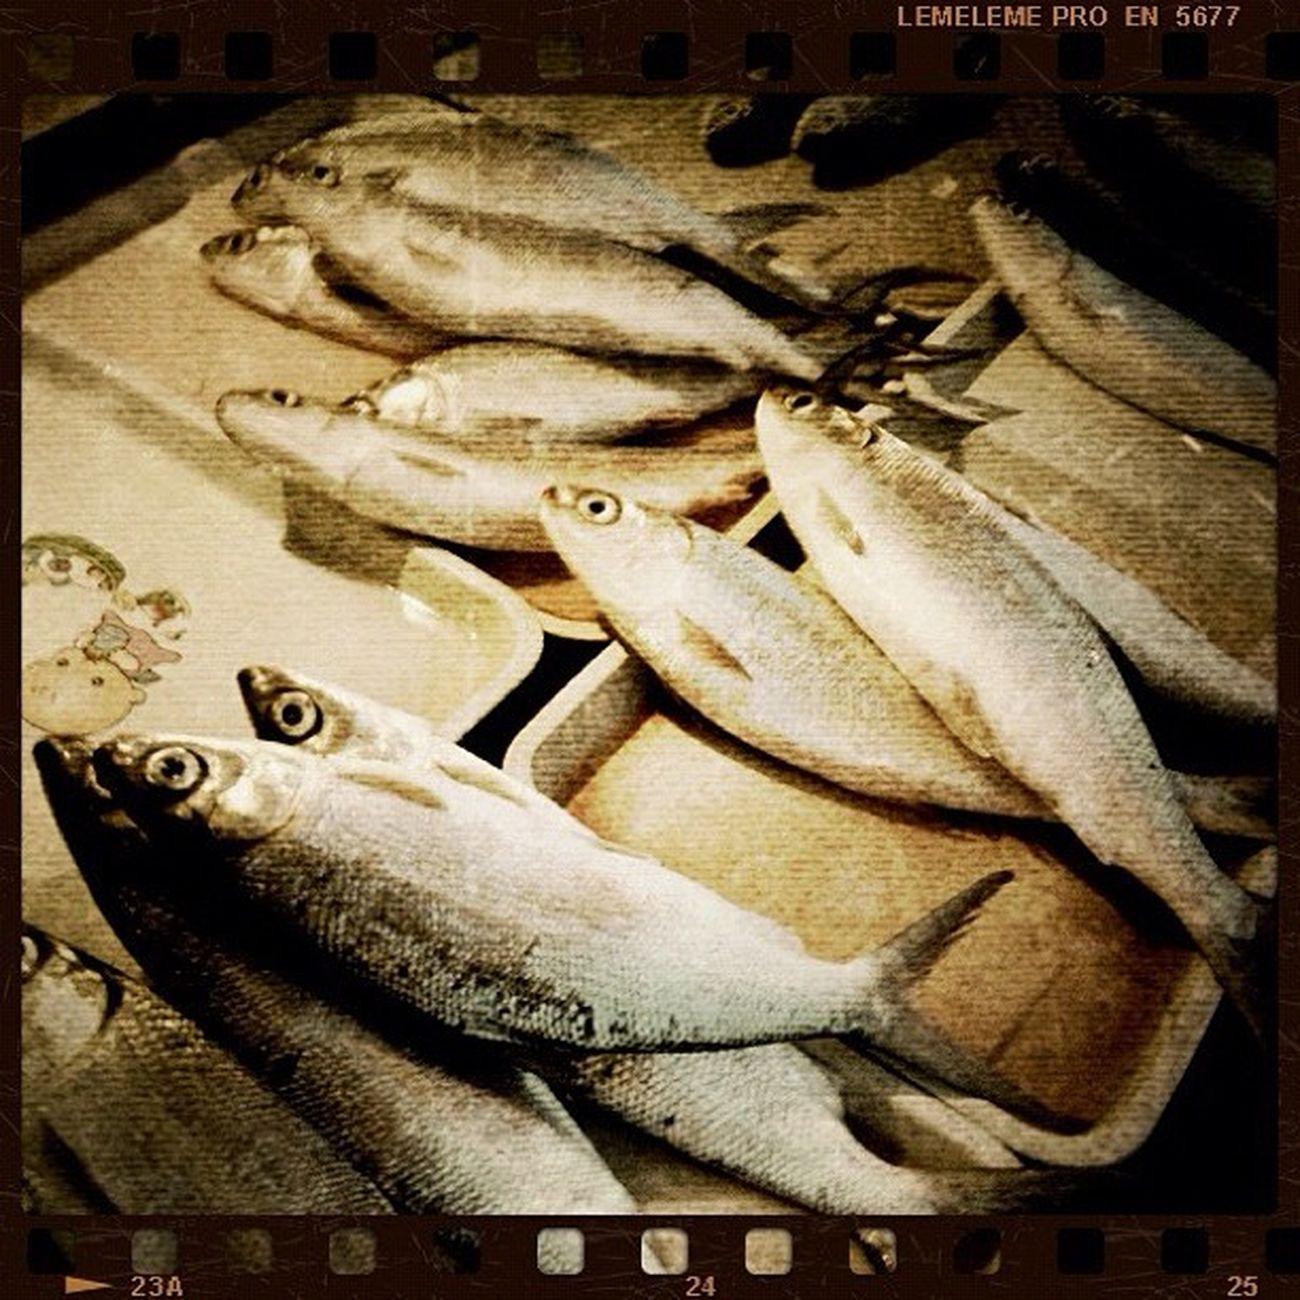 I smell somethin' Fishy . Bangus Milkfish Iloilo igersiloilo igersolongapo igersmanila igers jj jj_forum tbt fish foodpoc photodaily